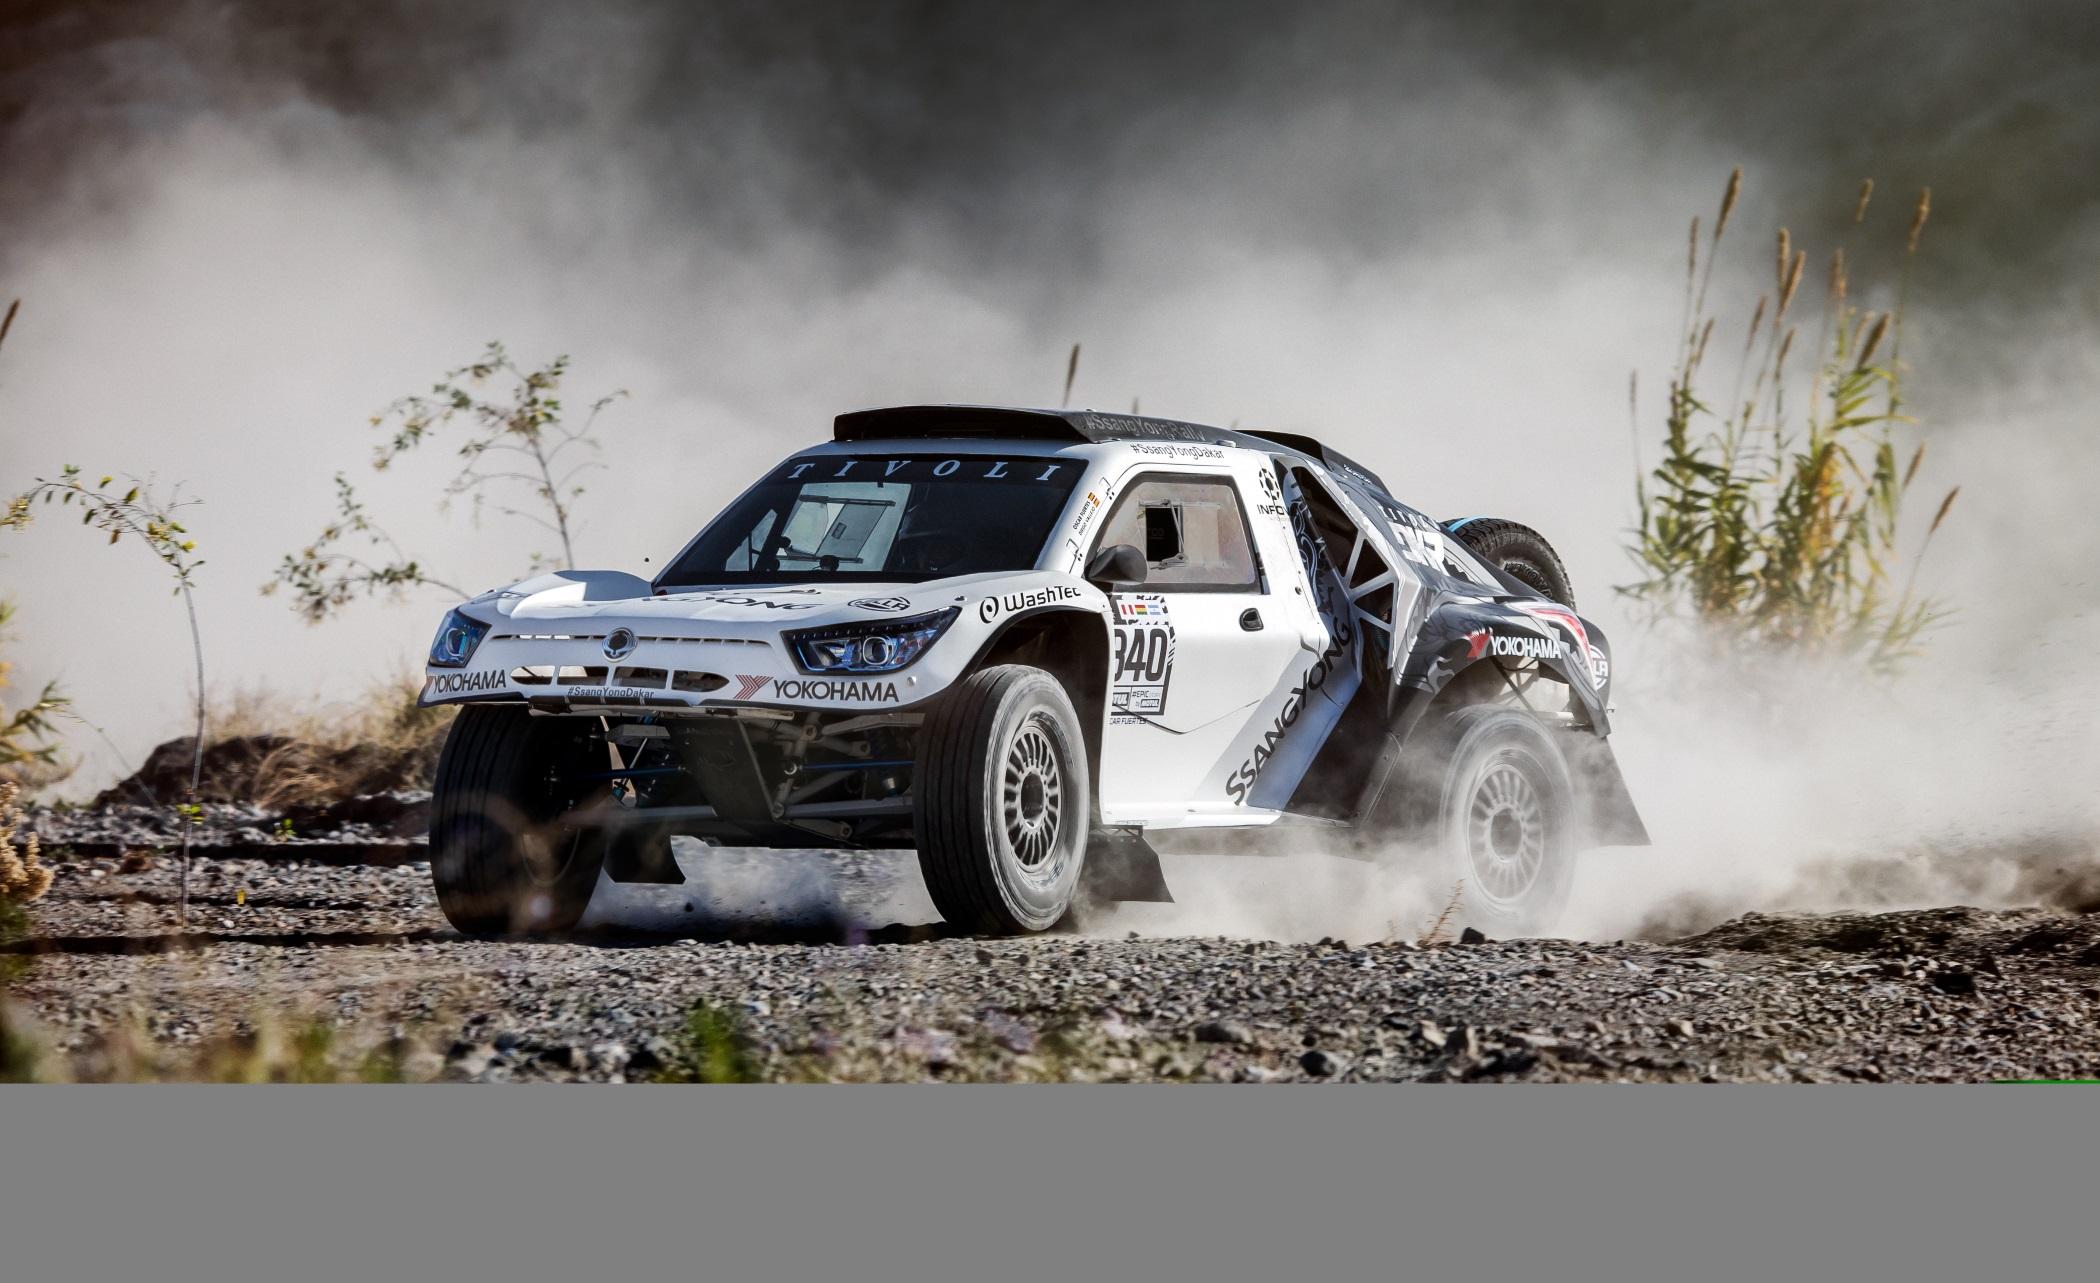 Yokohama Tire Sponsoring Team In 2018 Dakar Rally